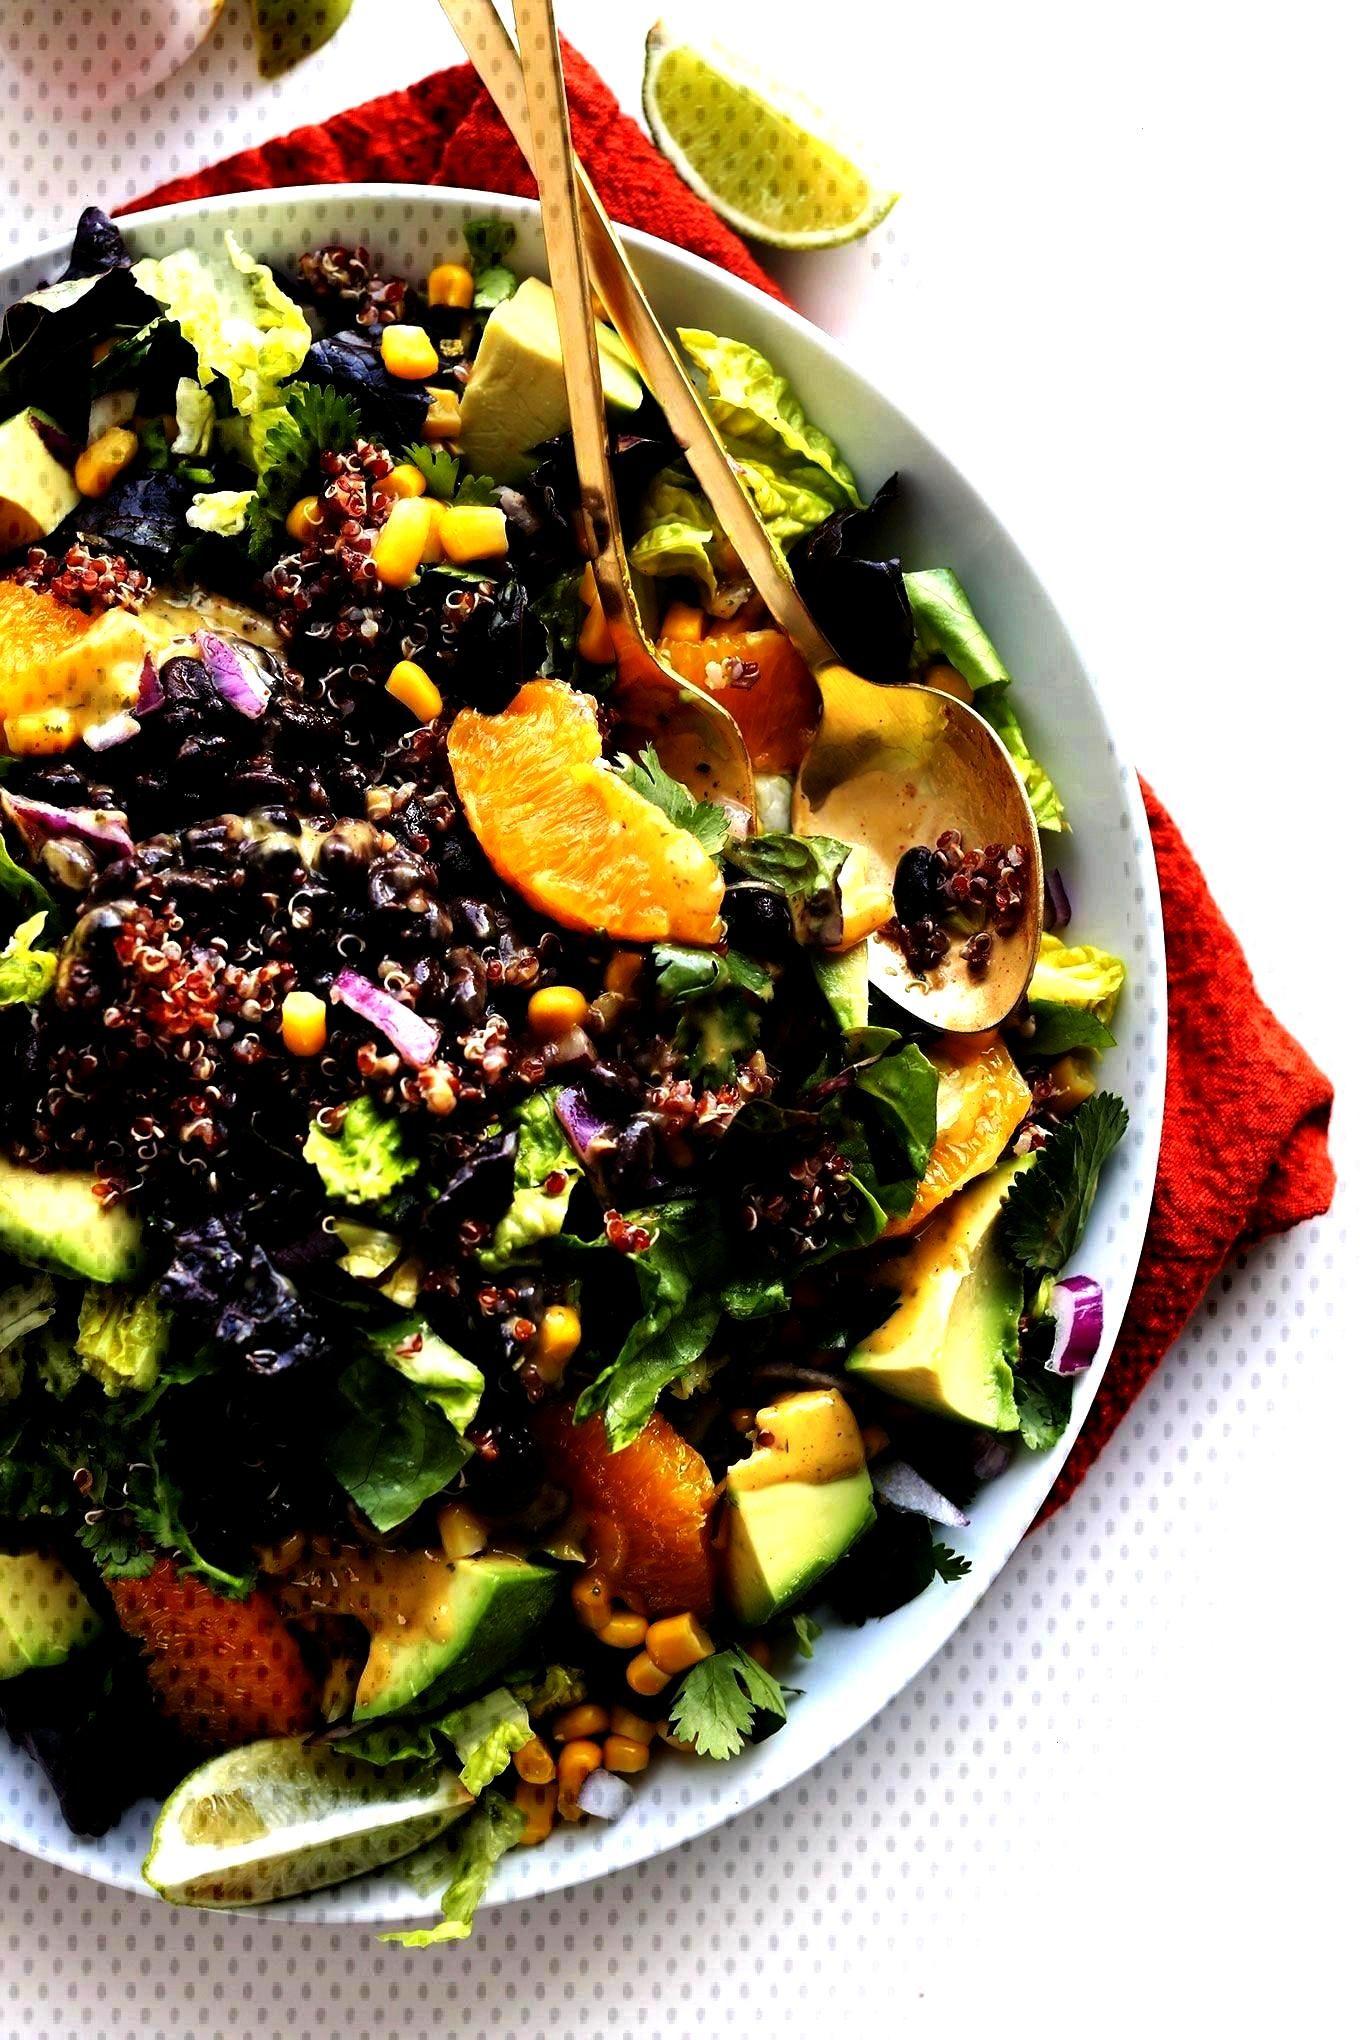 Vegan Salad with Corn, Black Beans, Quinoa, Avocado, and a Creamy Cilantro Orange Chili Dressing!Mi